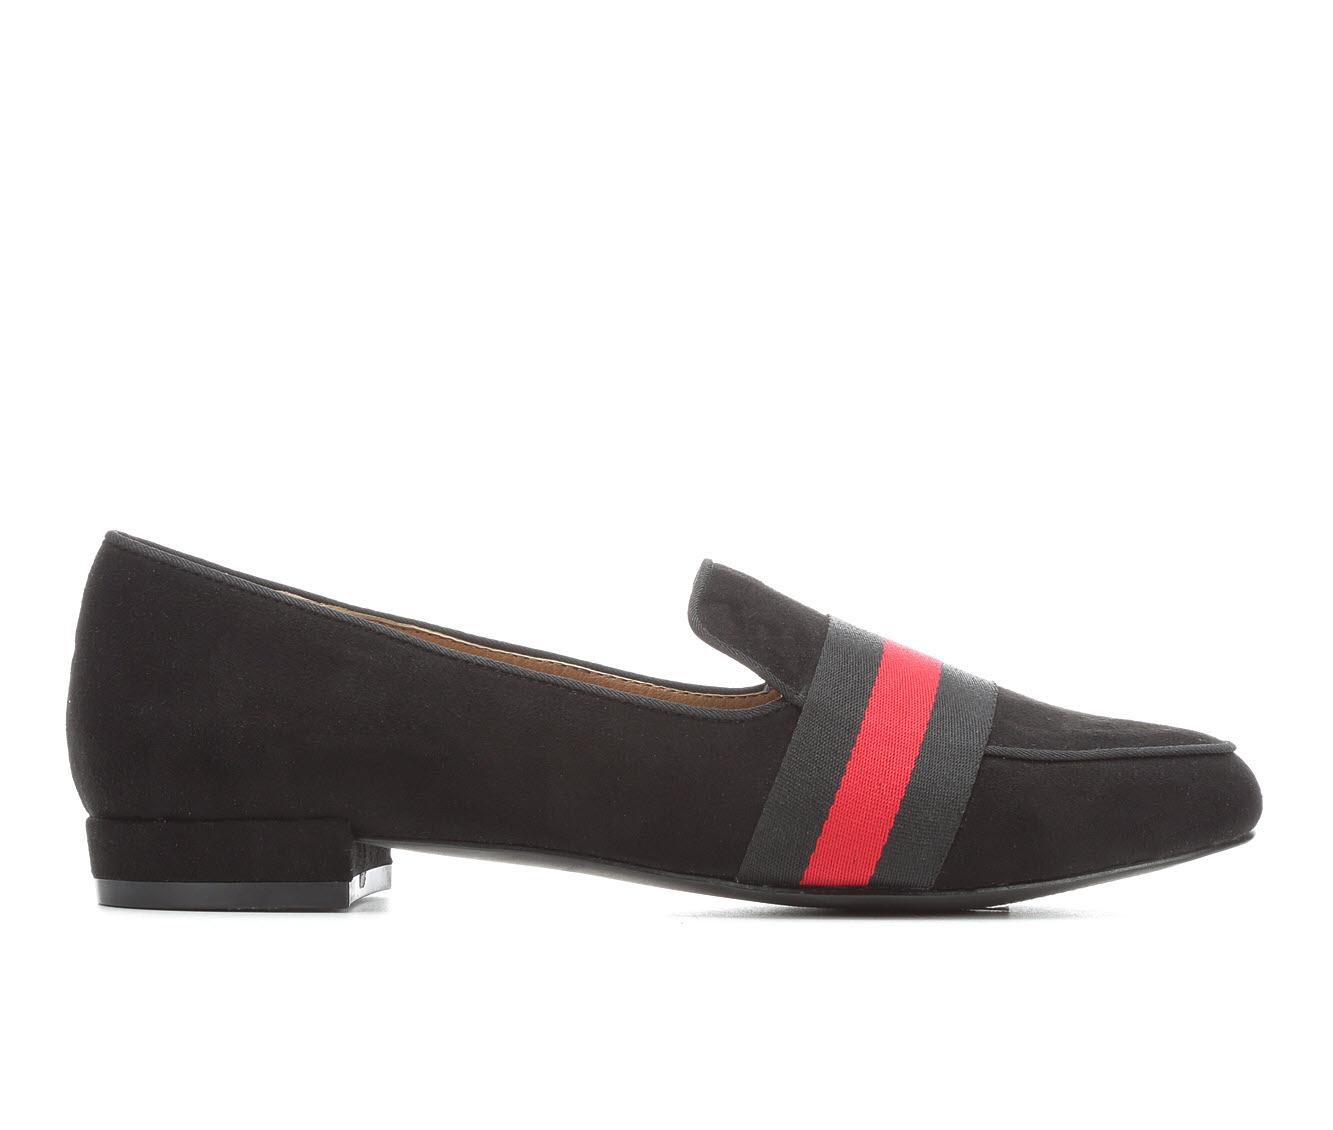 Madden Girl Sabella Women's Shoe (Black Canvas)